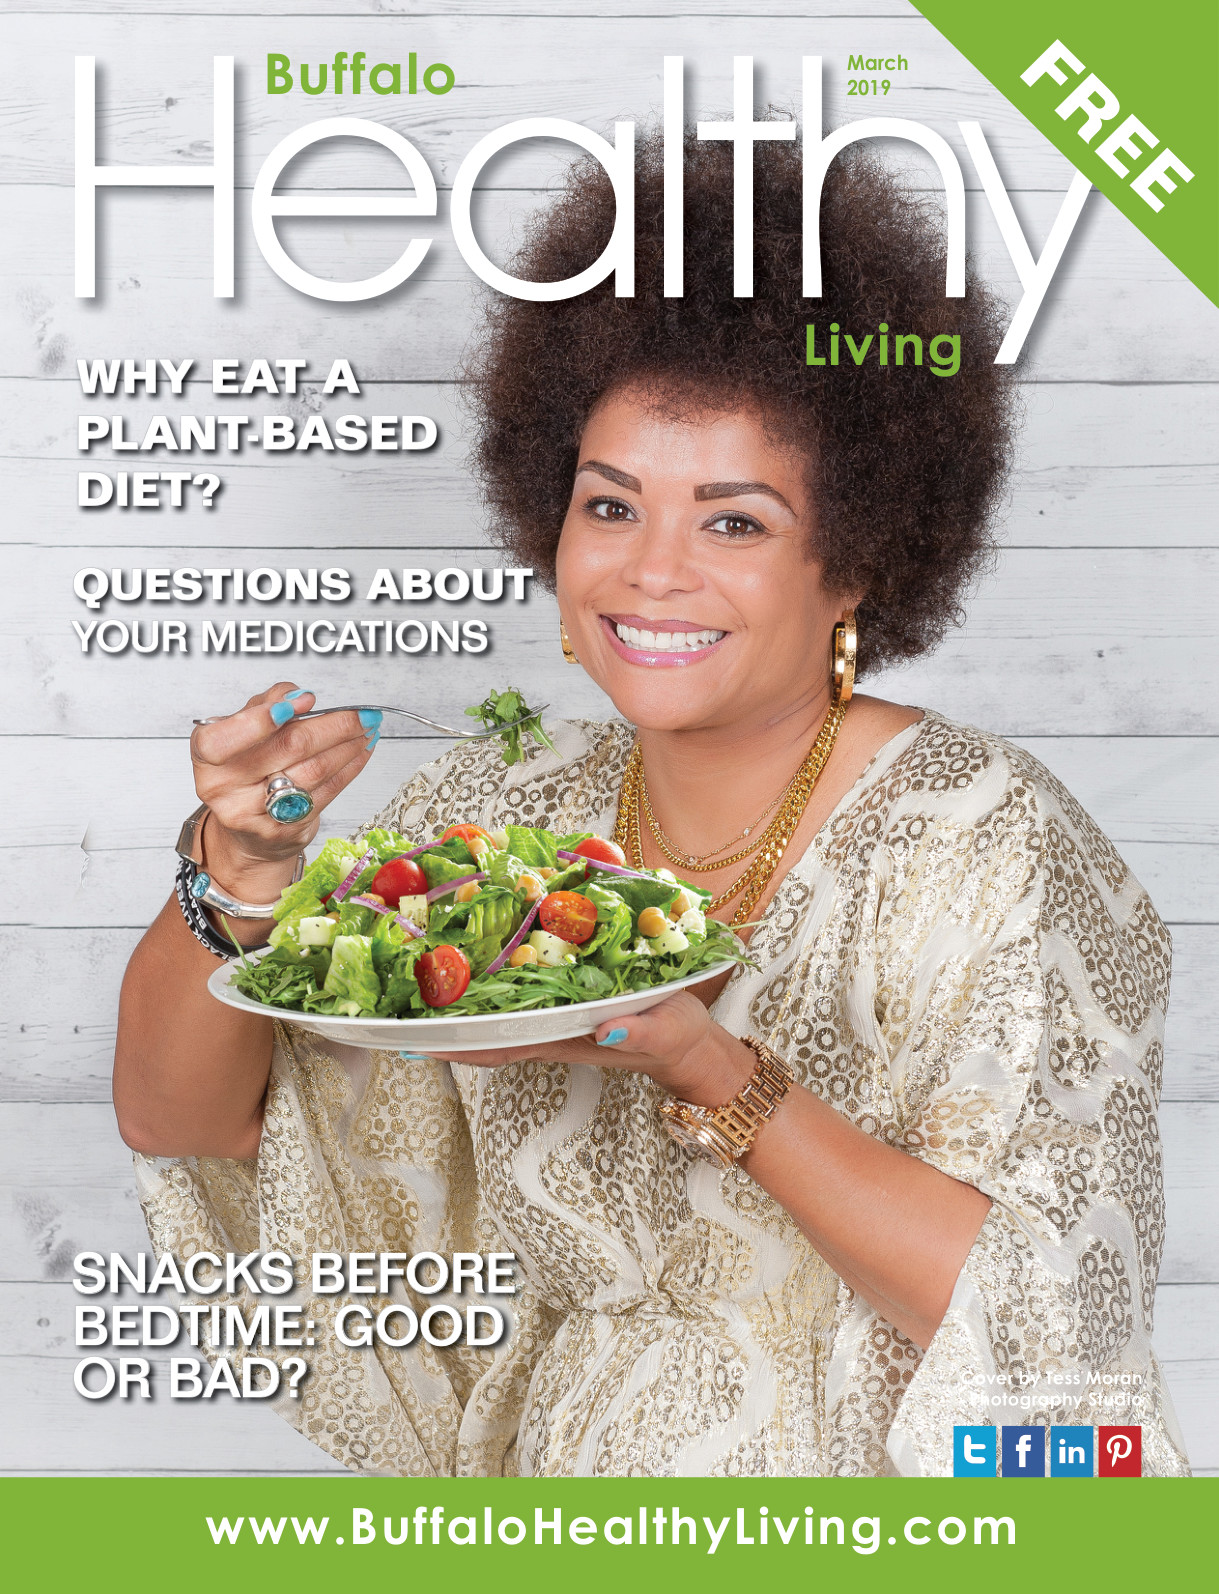 Buffalo Healthy Living March 2019